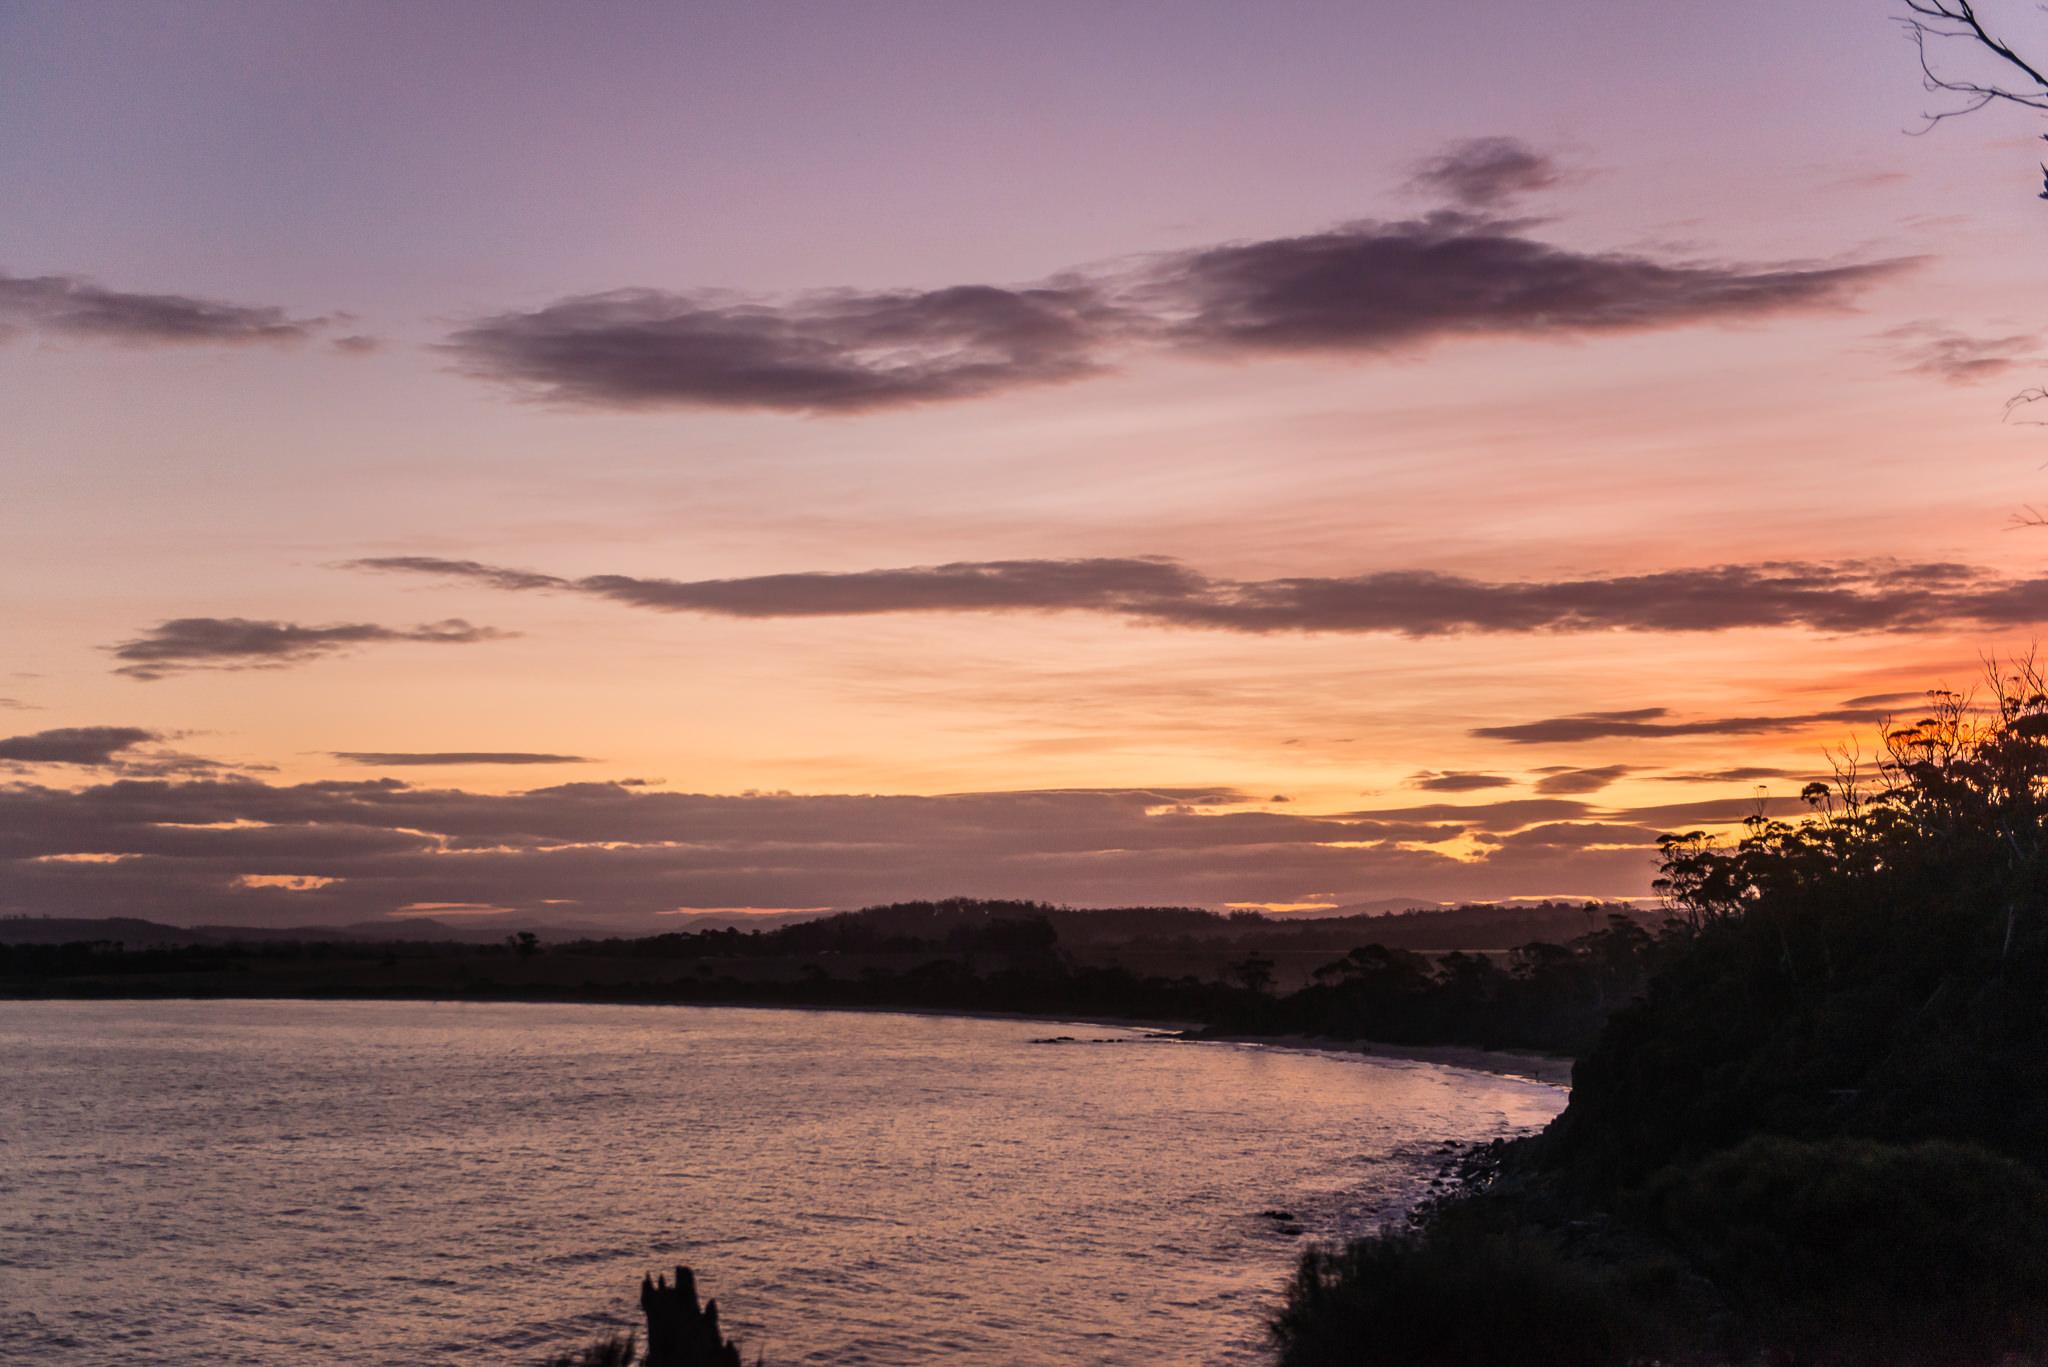 Sunset at Avalon